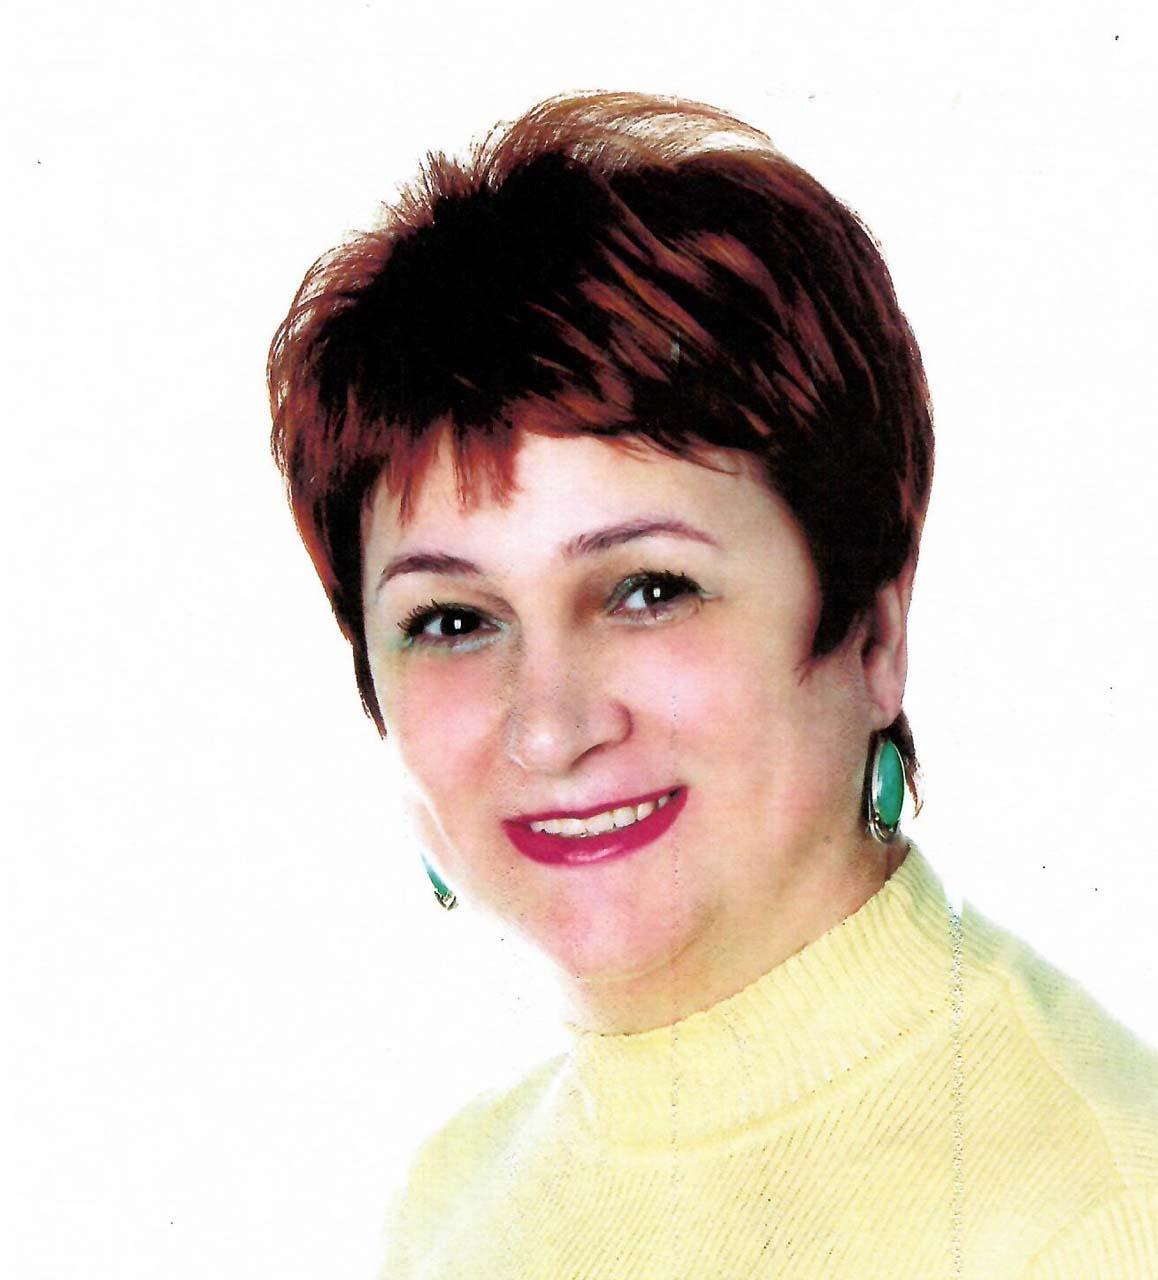 невролог Строганова Вера Андреевна